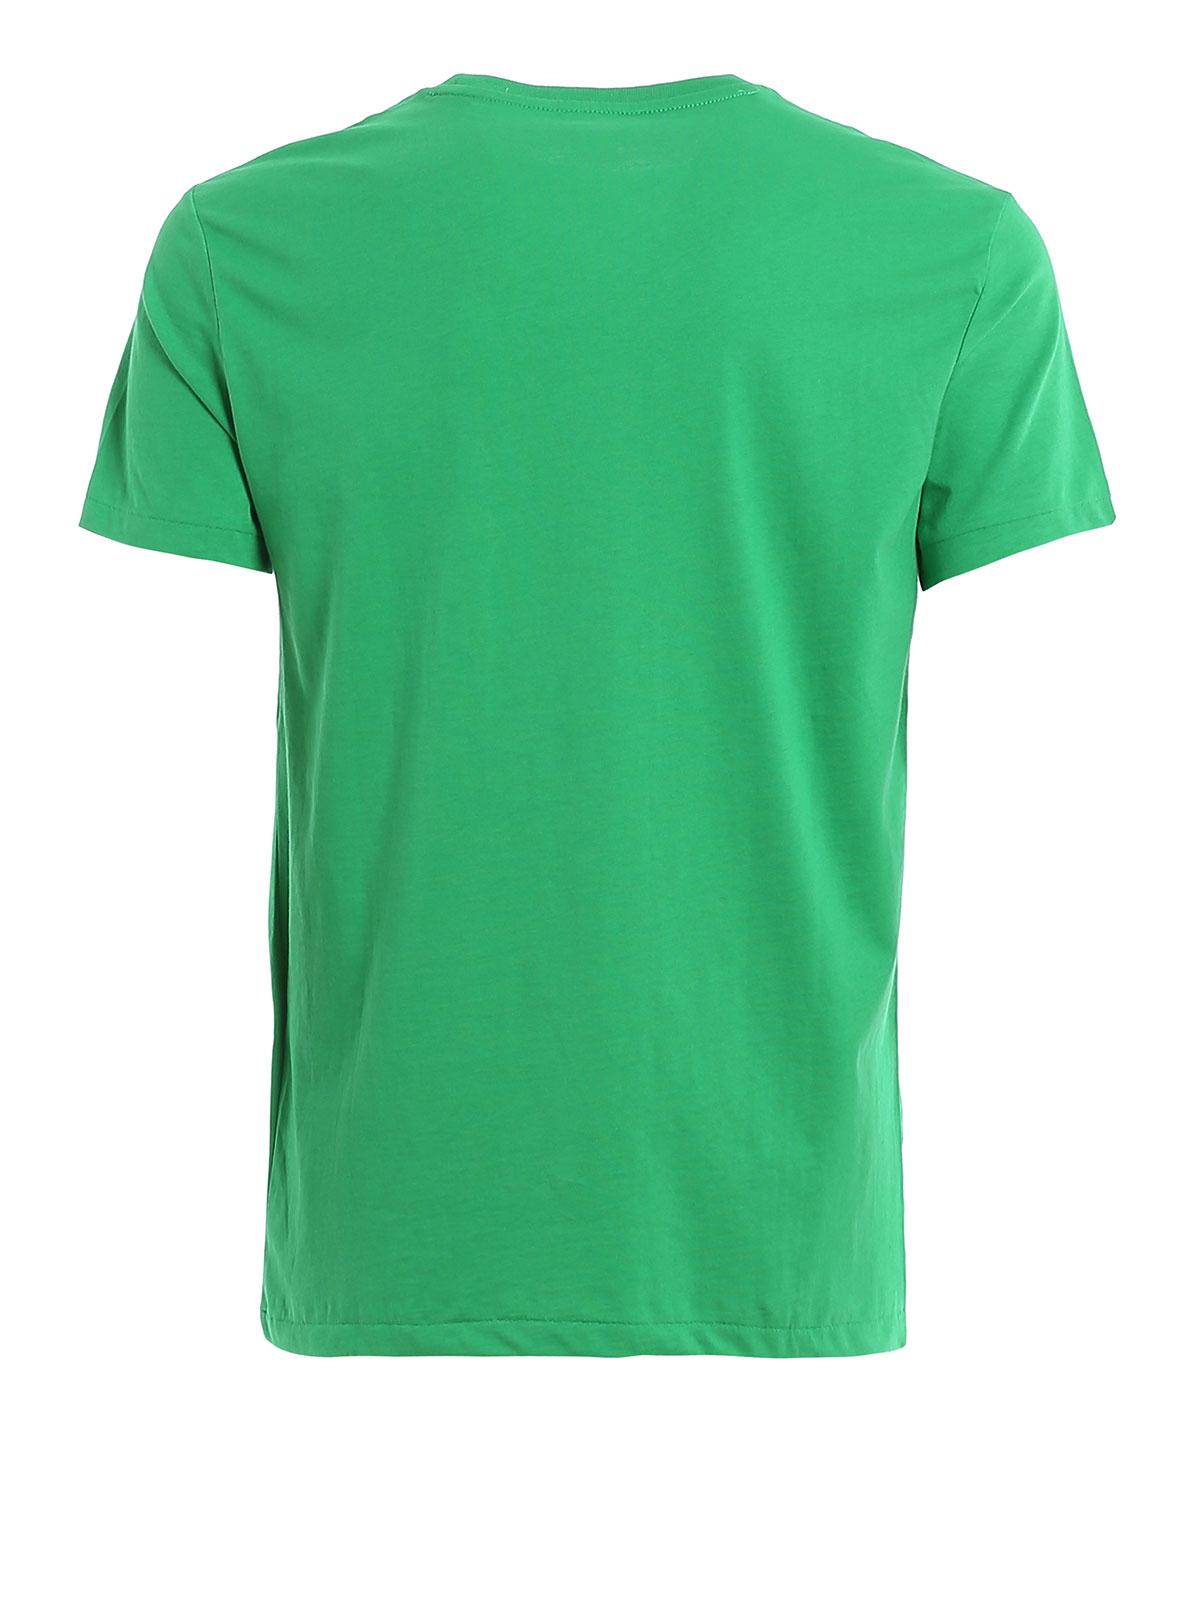 Picture of POLO RALPH LAUREN   Men's Custom Fit T-Shirt